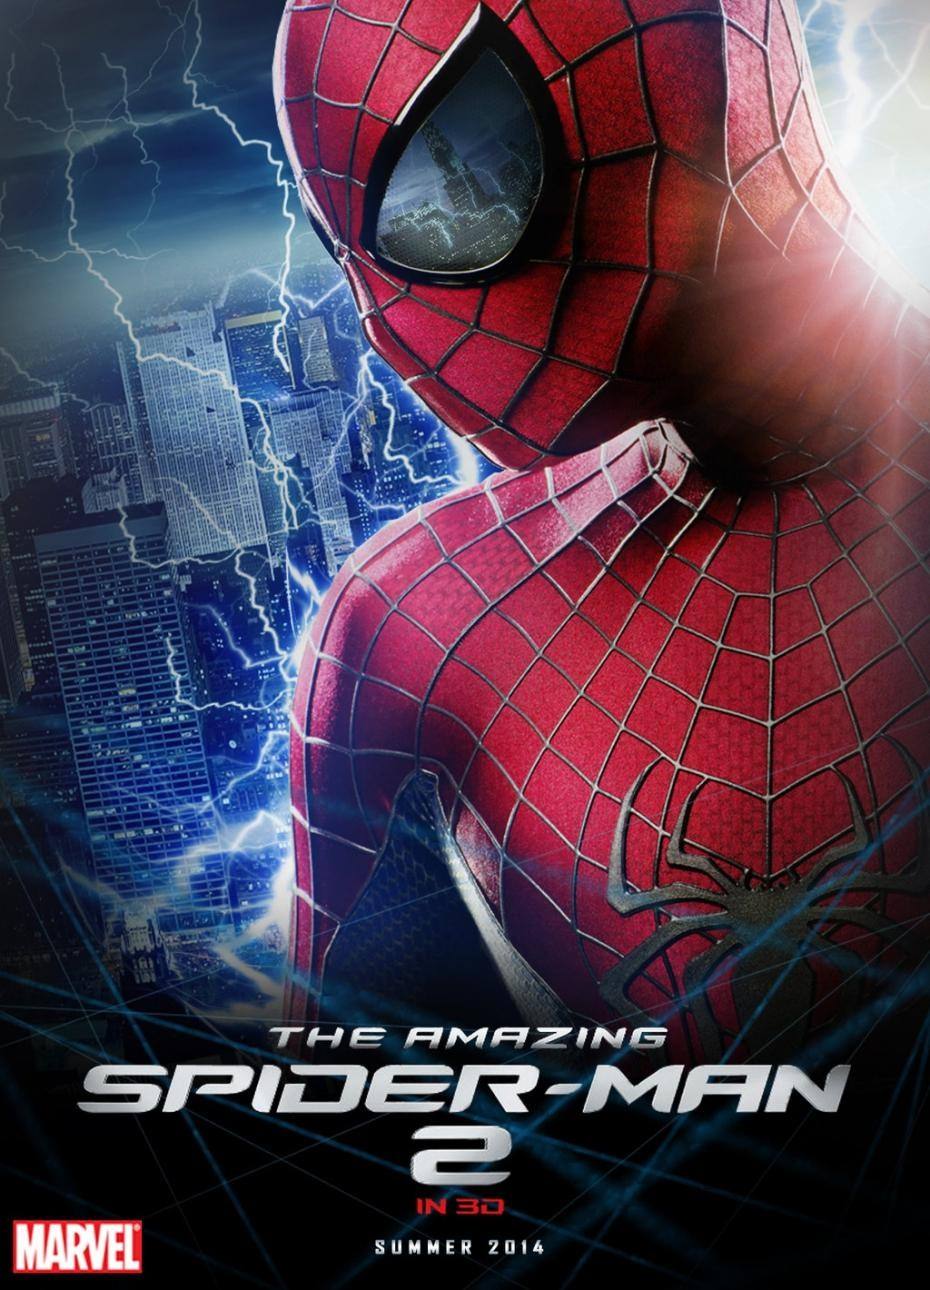 Affiche et Photos The Amazing Spider-Man 2 (2014)